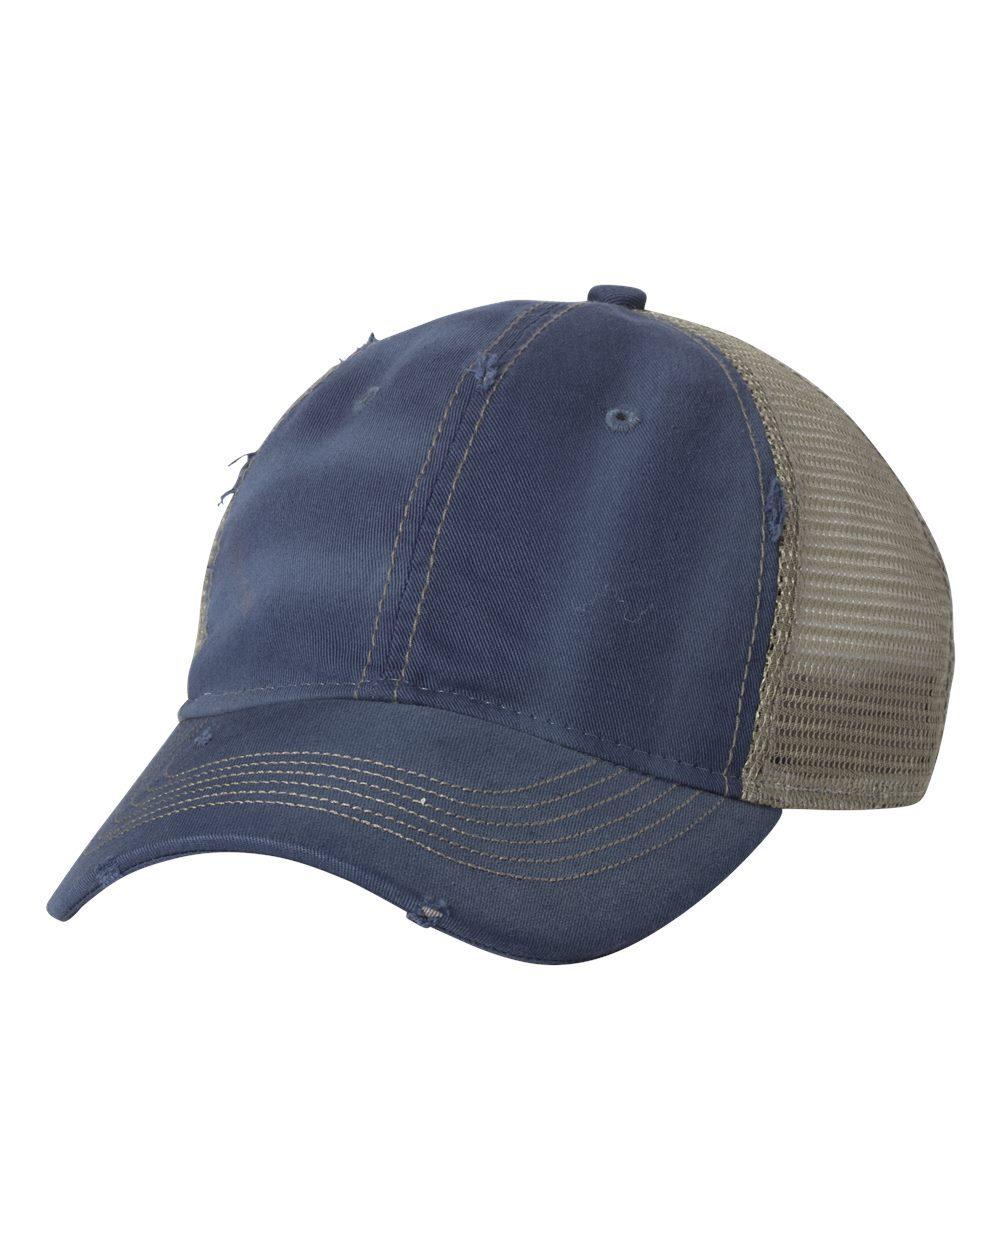 Sportsman 3150 - Bounty Dirty-Washed Mesh Back Trucker Cap